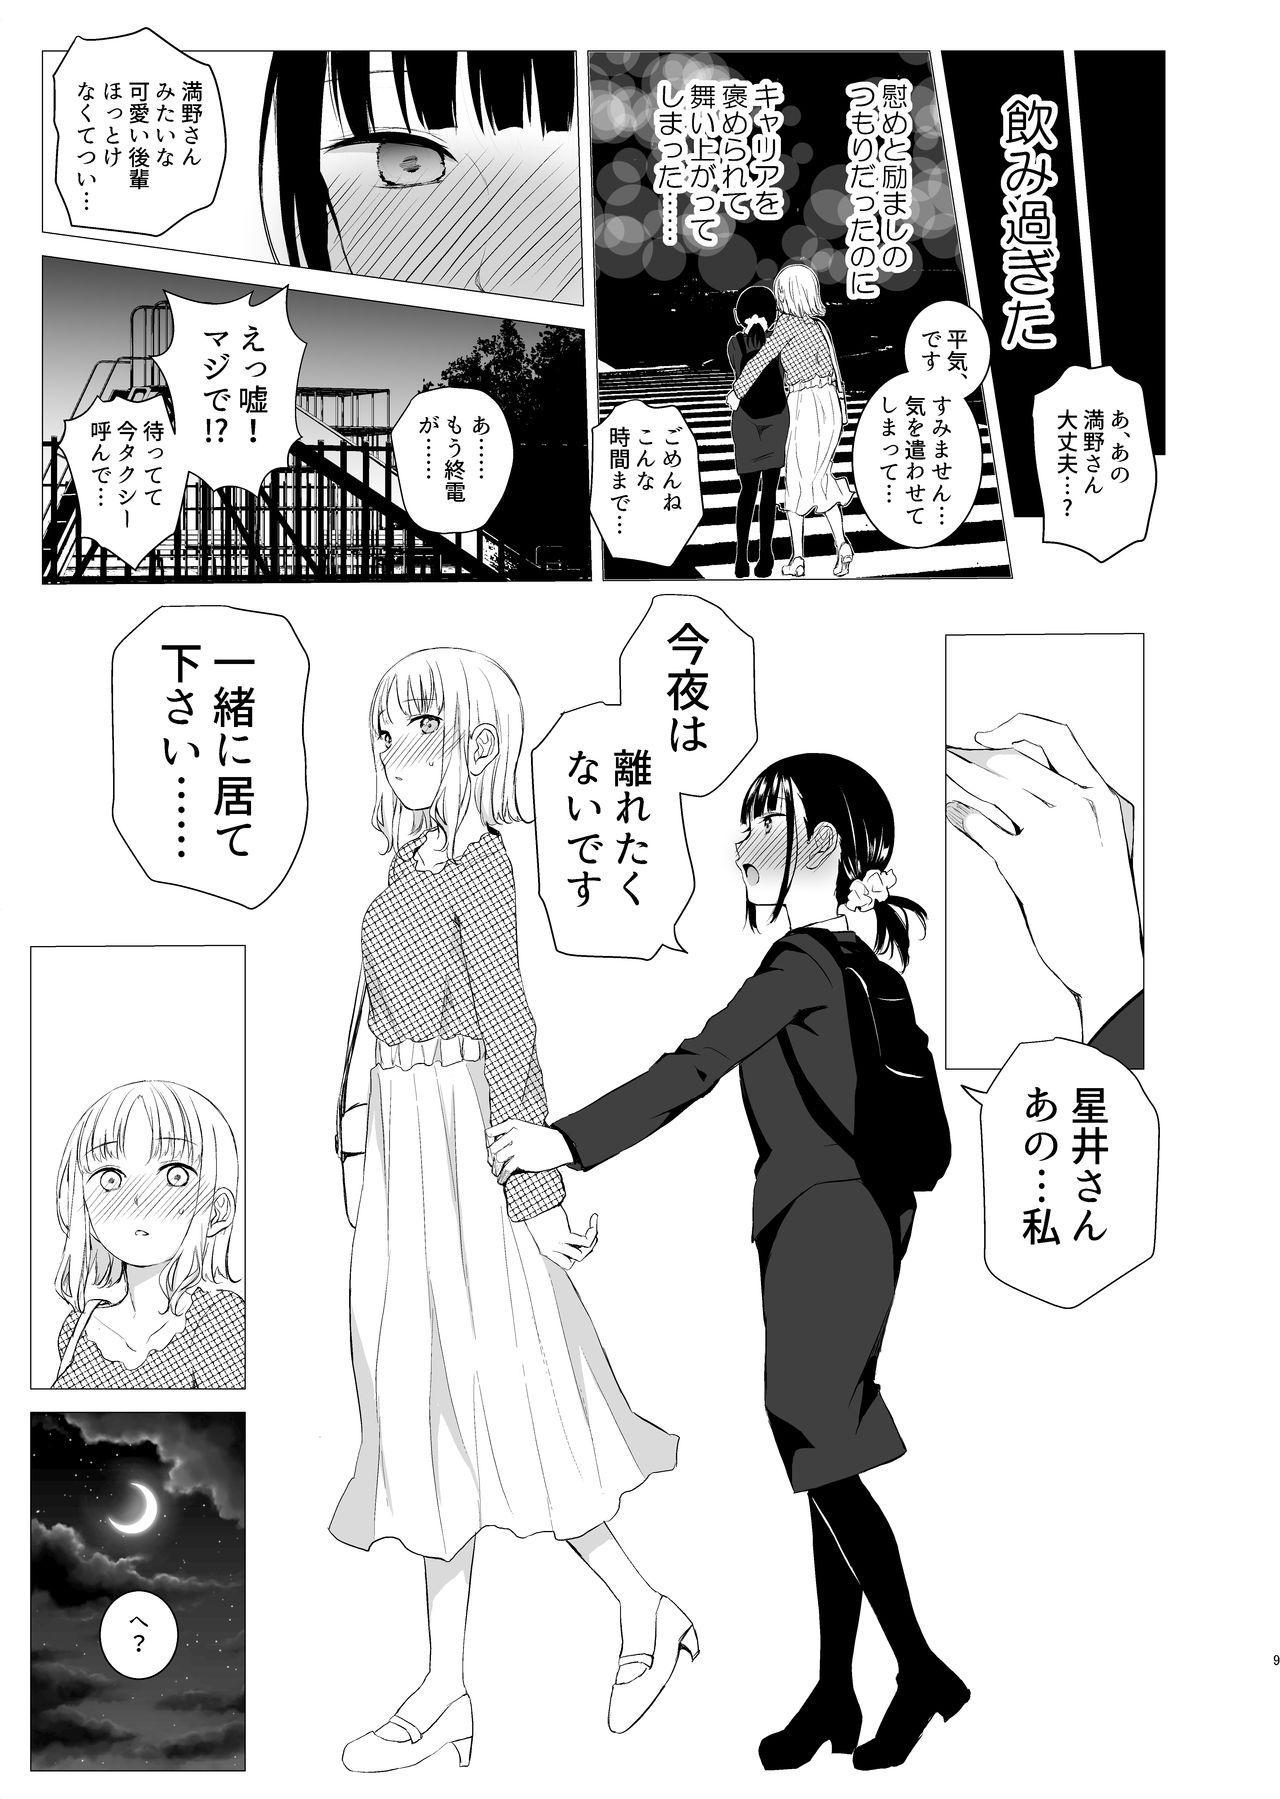 Hanayomi no Makurakotoba 7